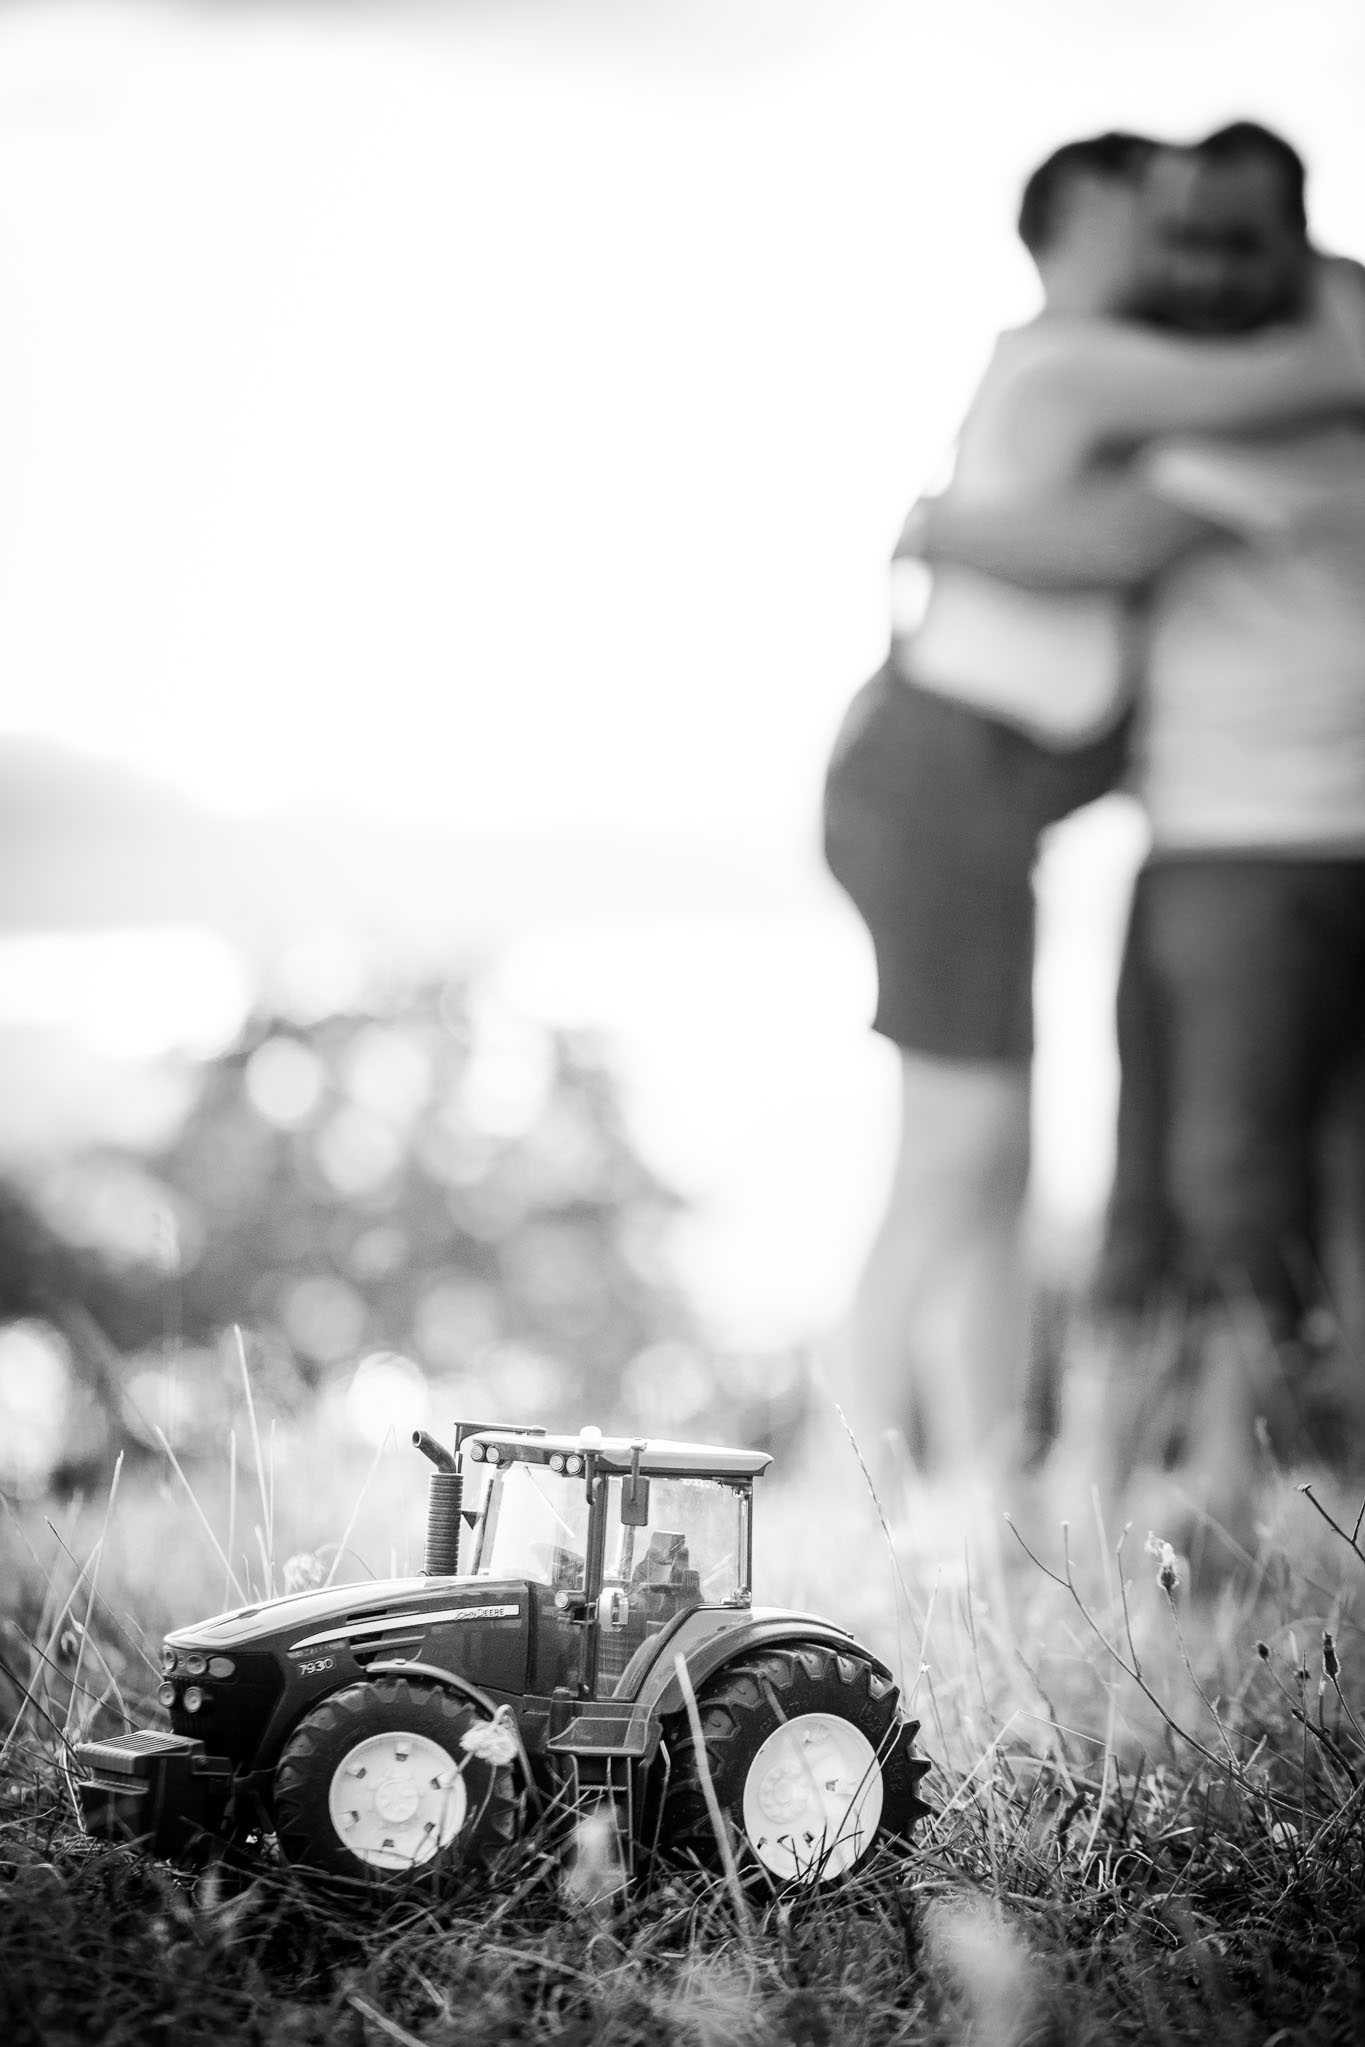 grossesse-femme-enceinte-couple-nature-campagne-ingold-photographe-101.jpg